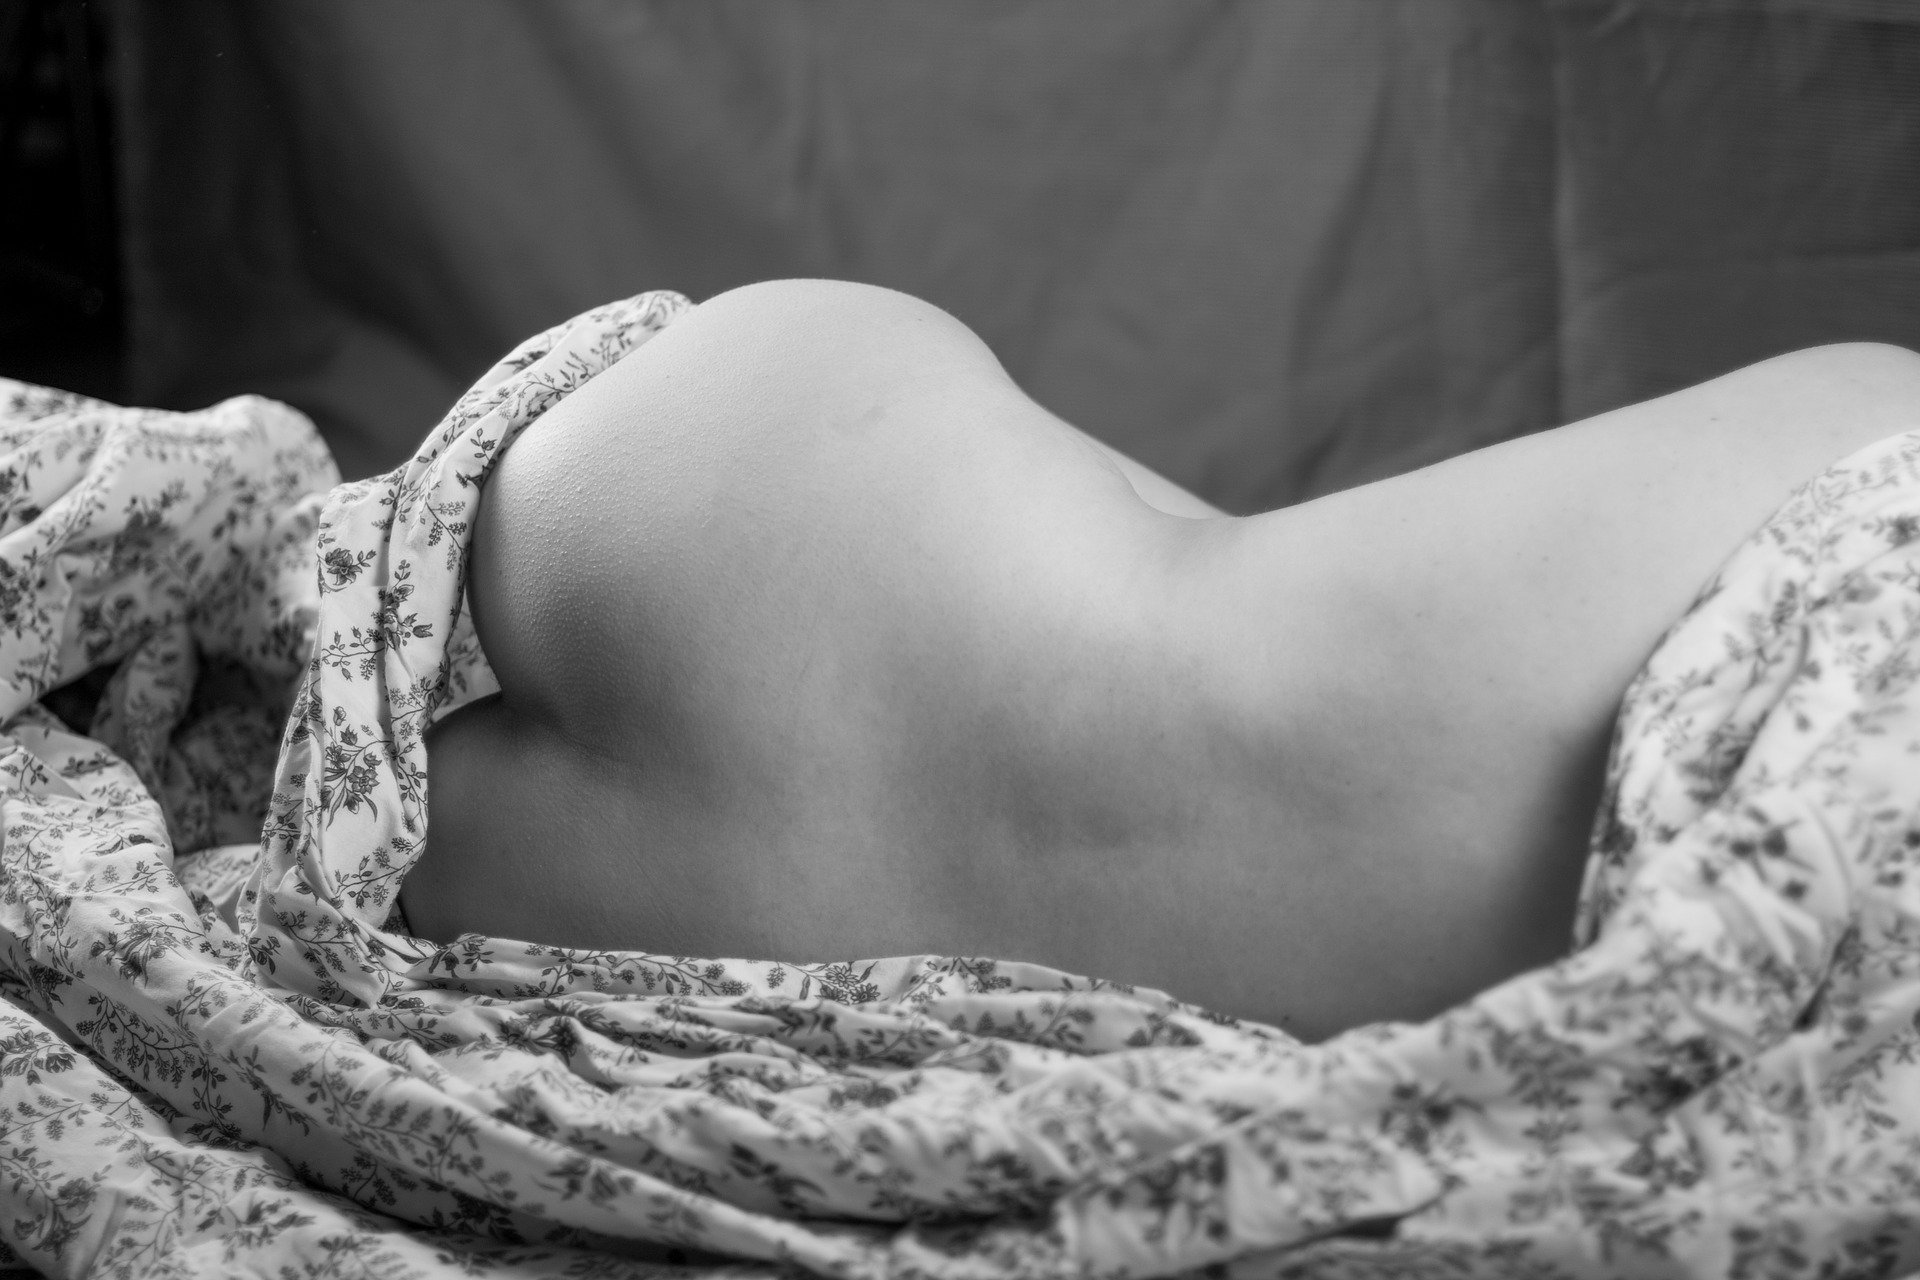 nude-woman-3797749_1920